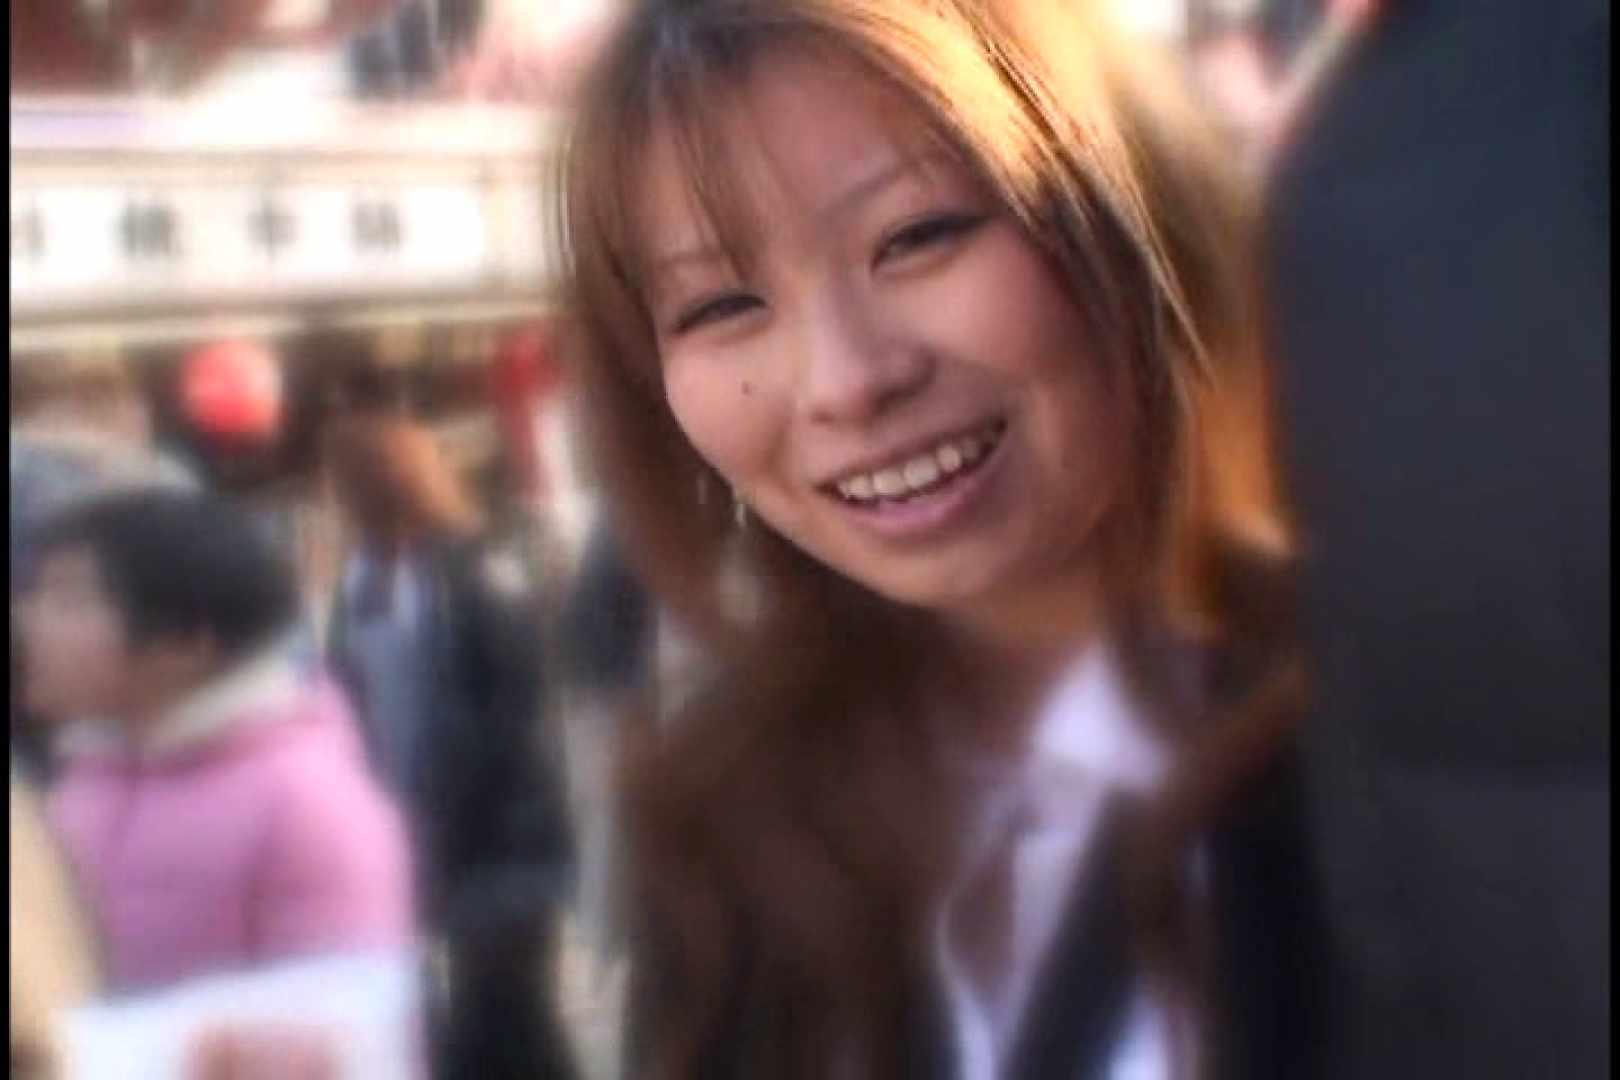 JDハンター全国ツアー vol.014 前編 女子大生丸裸  84pic 34